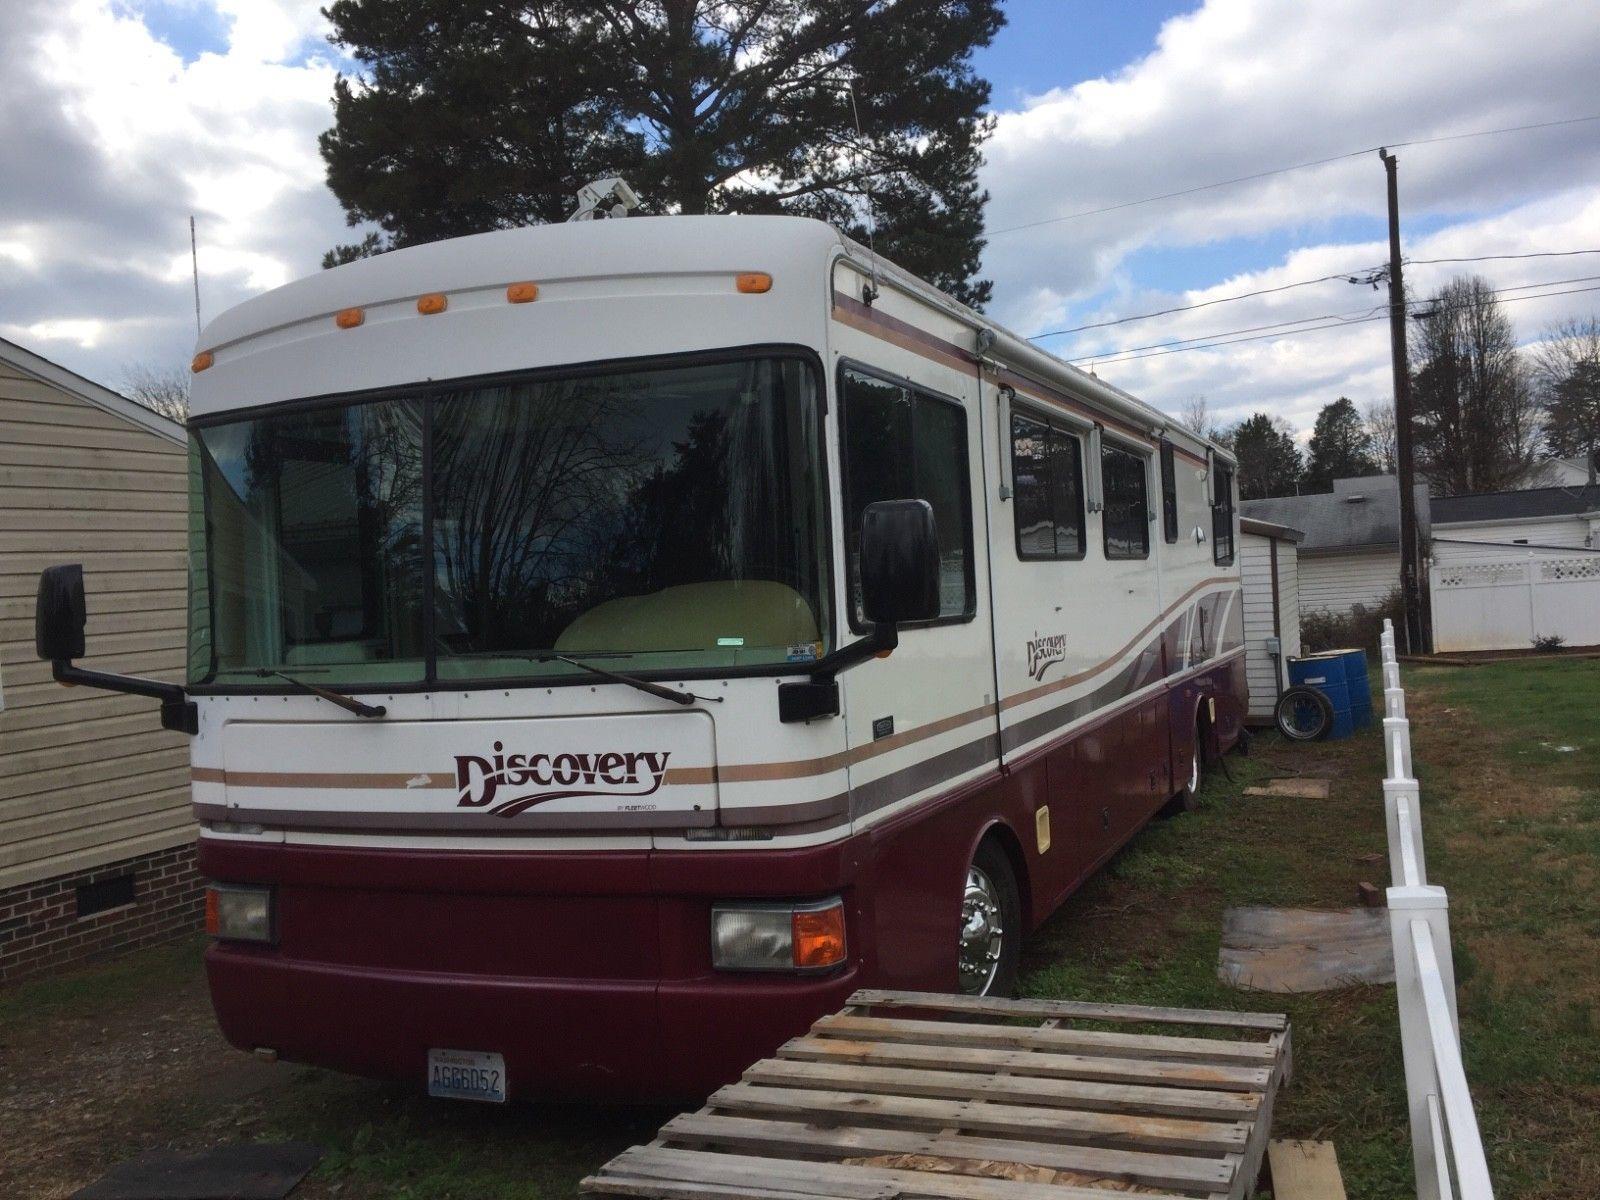 very nice 1998 Fleetwood Discovery motorhome camper